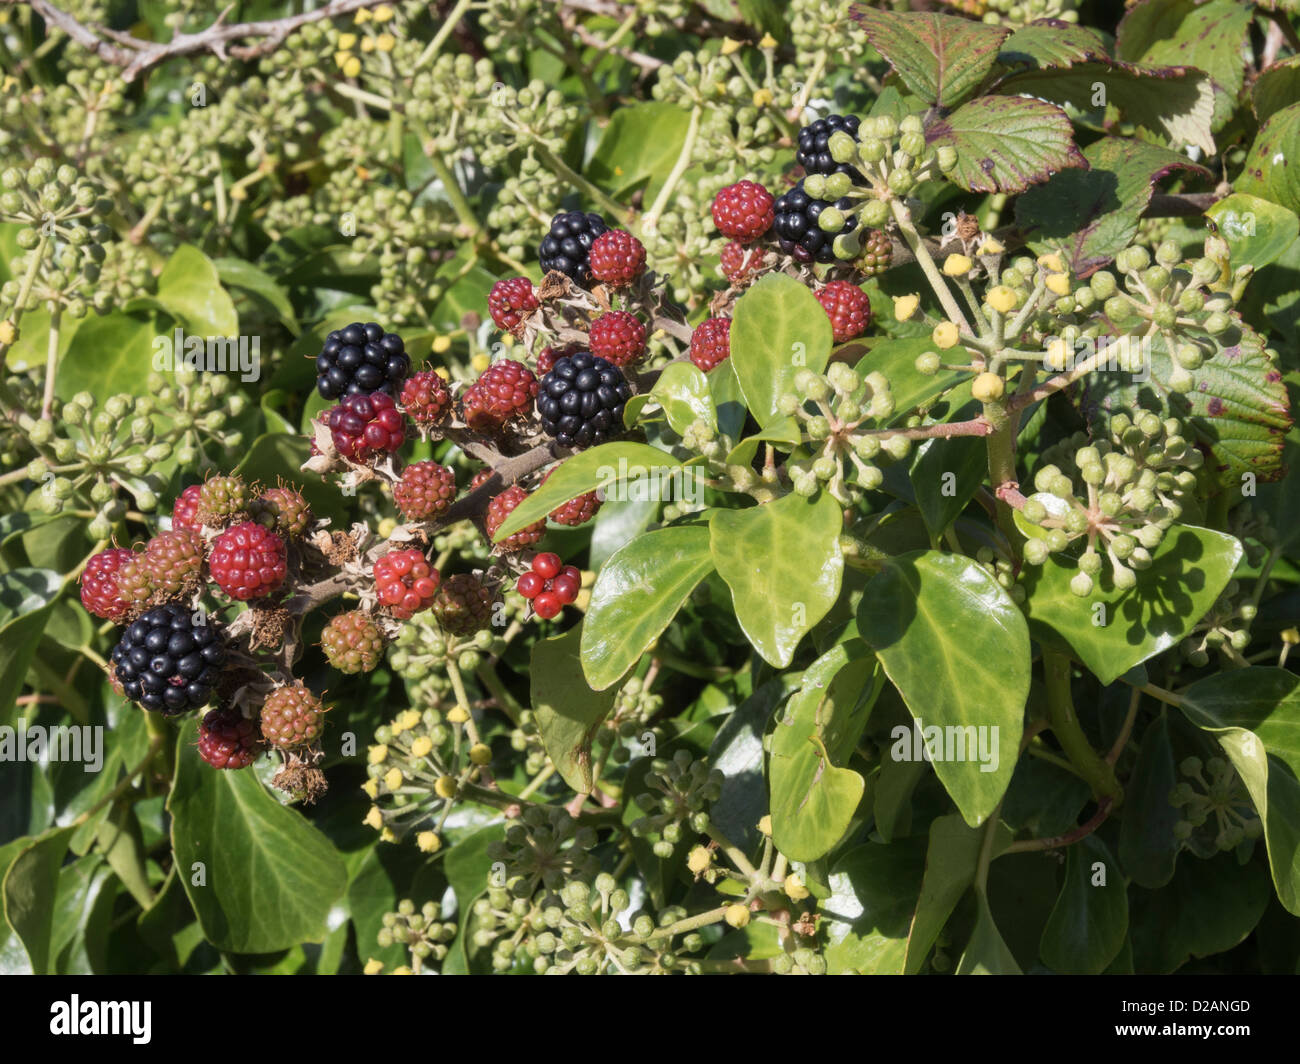 Where To Buy Blackberry Bushes